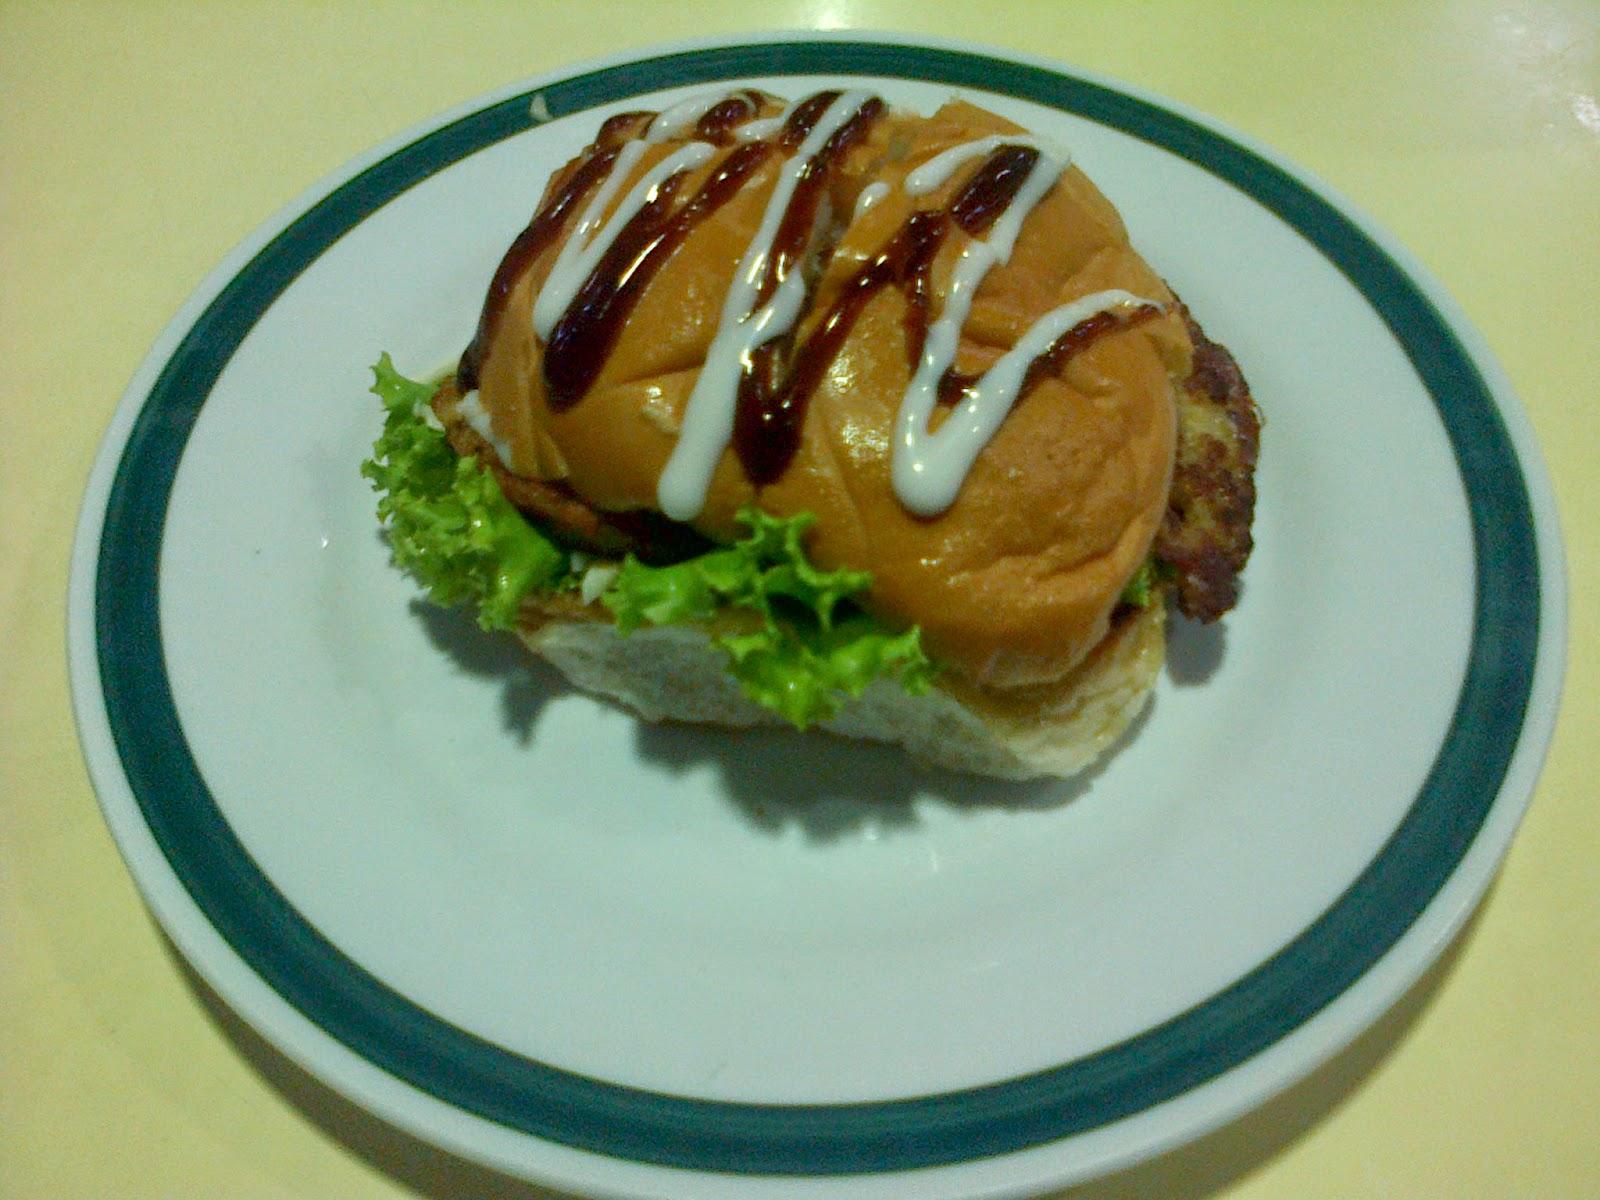 Aman Burger, astaka bukit gedung, western food, hidangan sedap